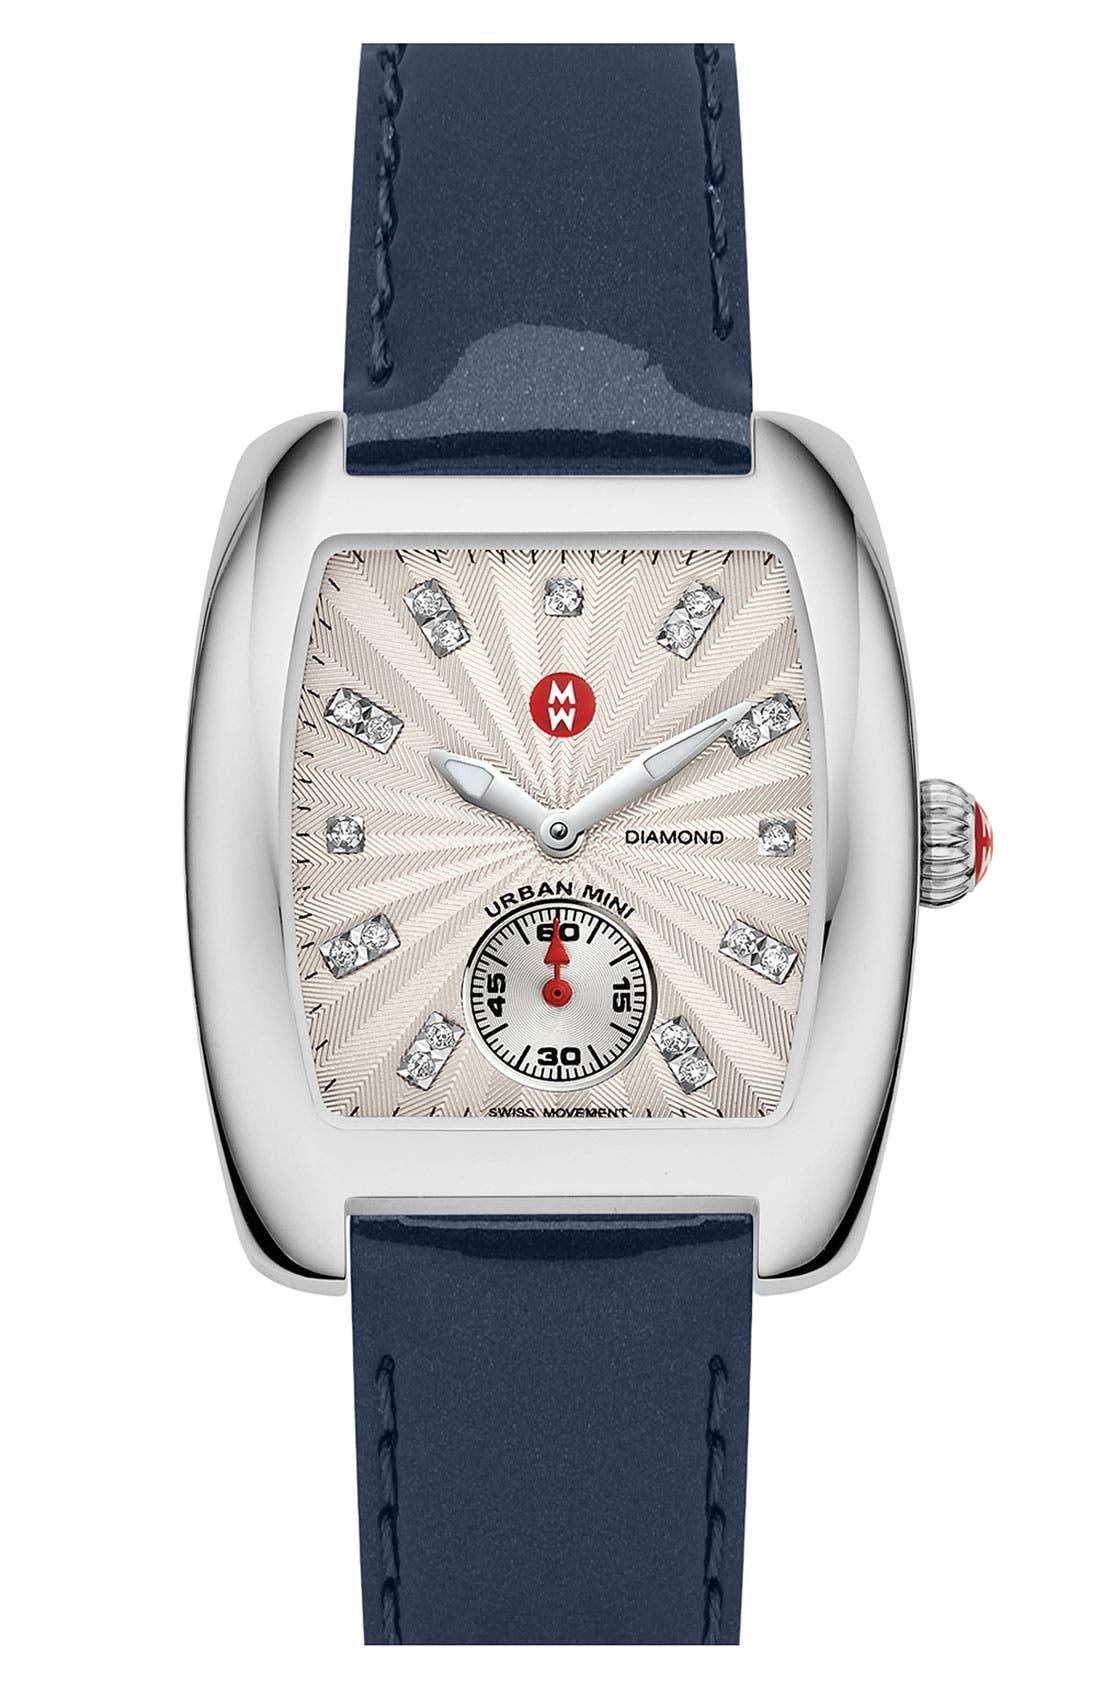 Main Image - MICHELE 'Urban Mini' Diamond Dial Watch Case & 16mm Navy Patent Leather Strap